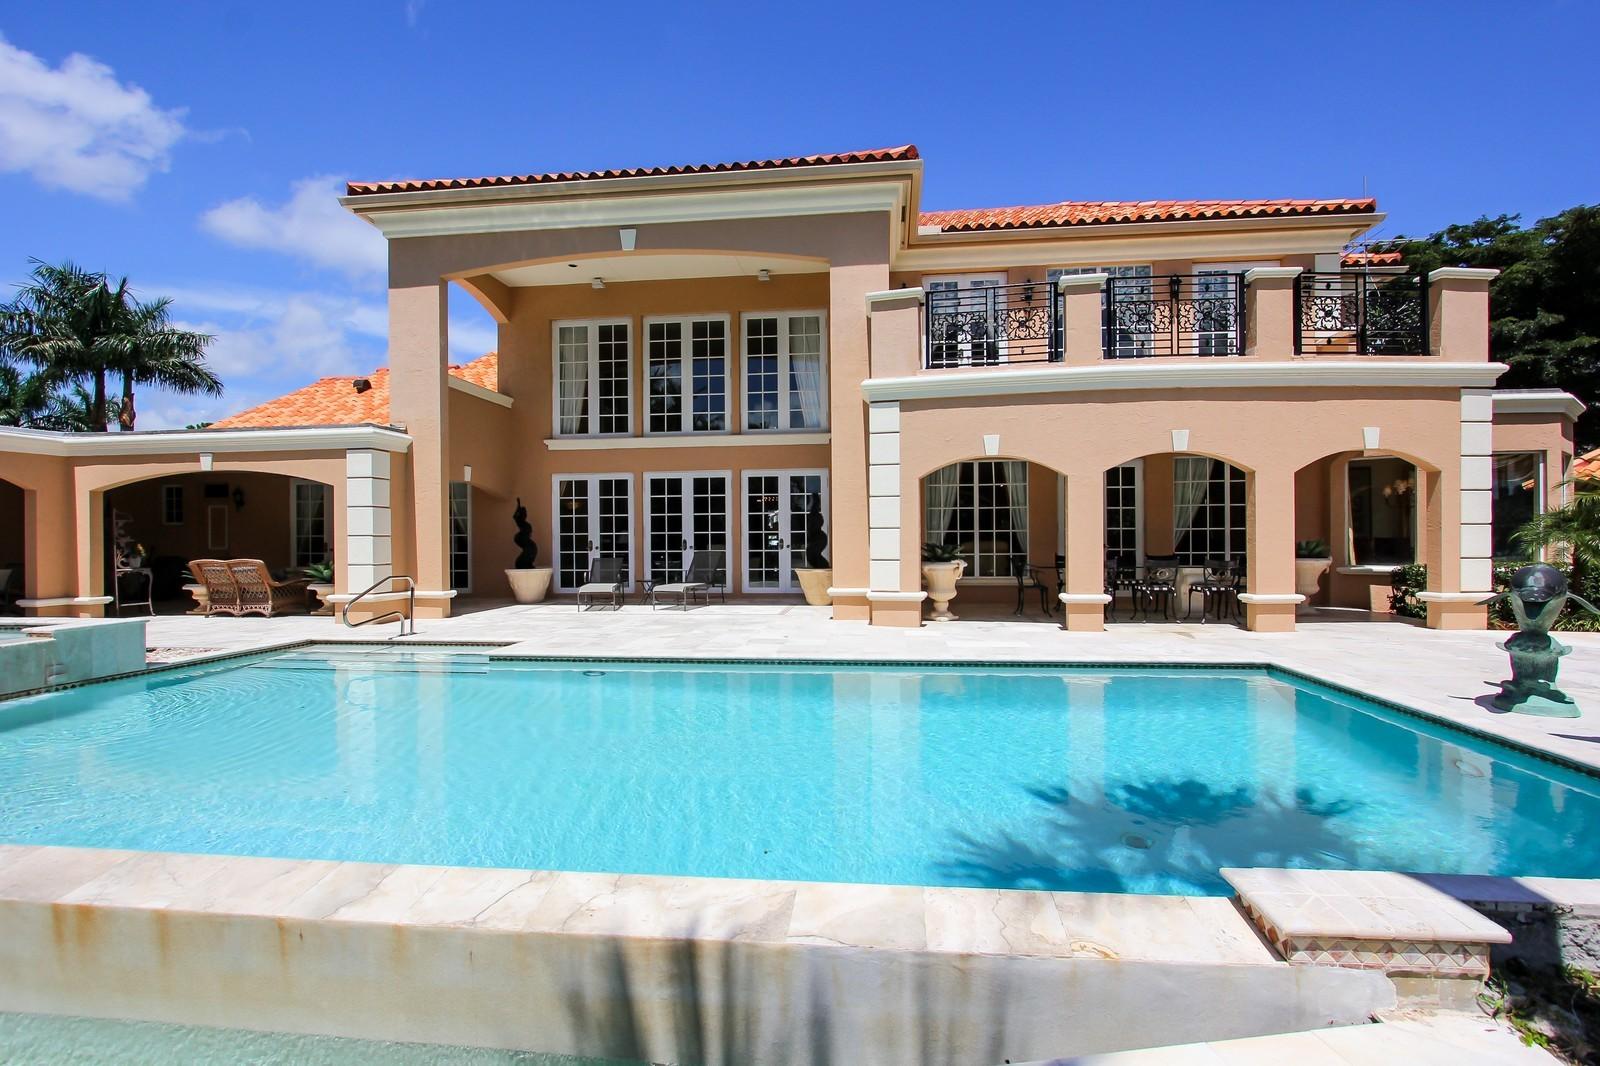 Real Estate Photography - 7015 Ayrshire Ln, Boca Raton, FL, 33496 - Rear View